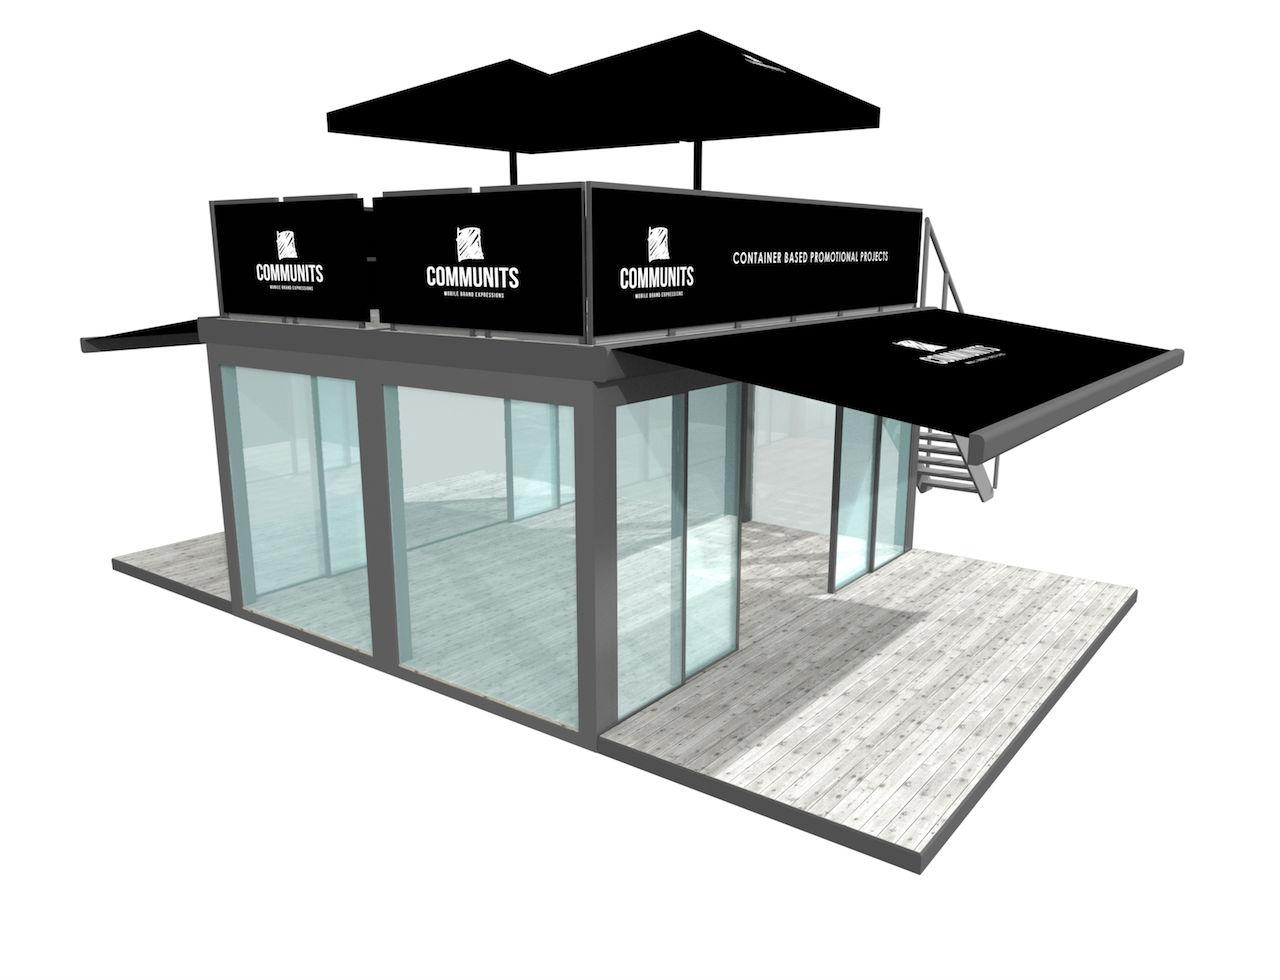 Glazen box Communits Communits eventcontainers popup shops voor evenementen en festivals